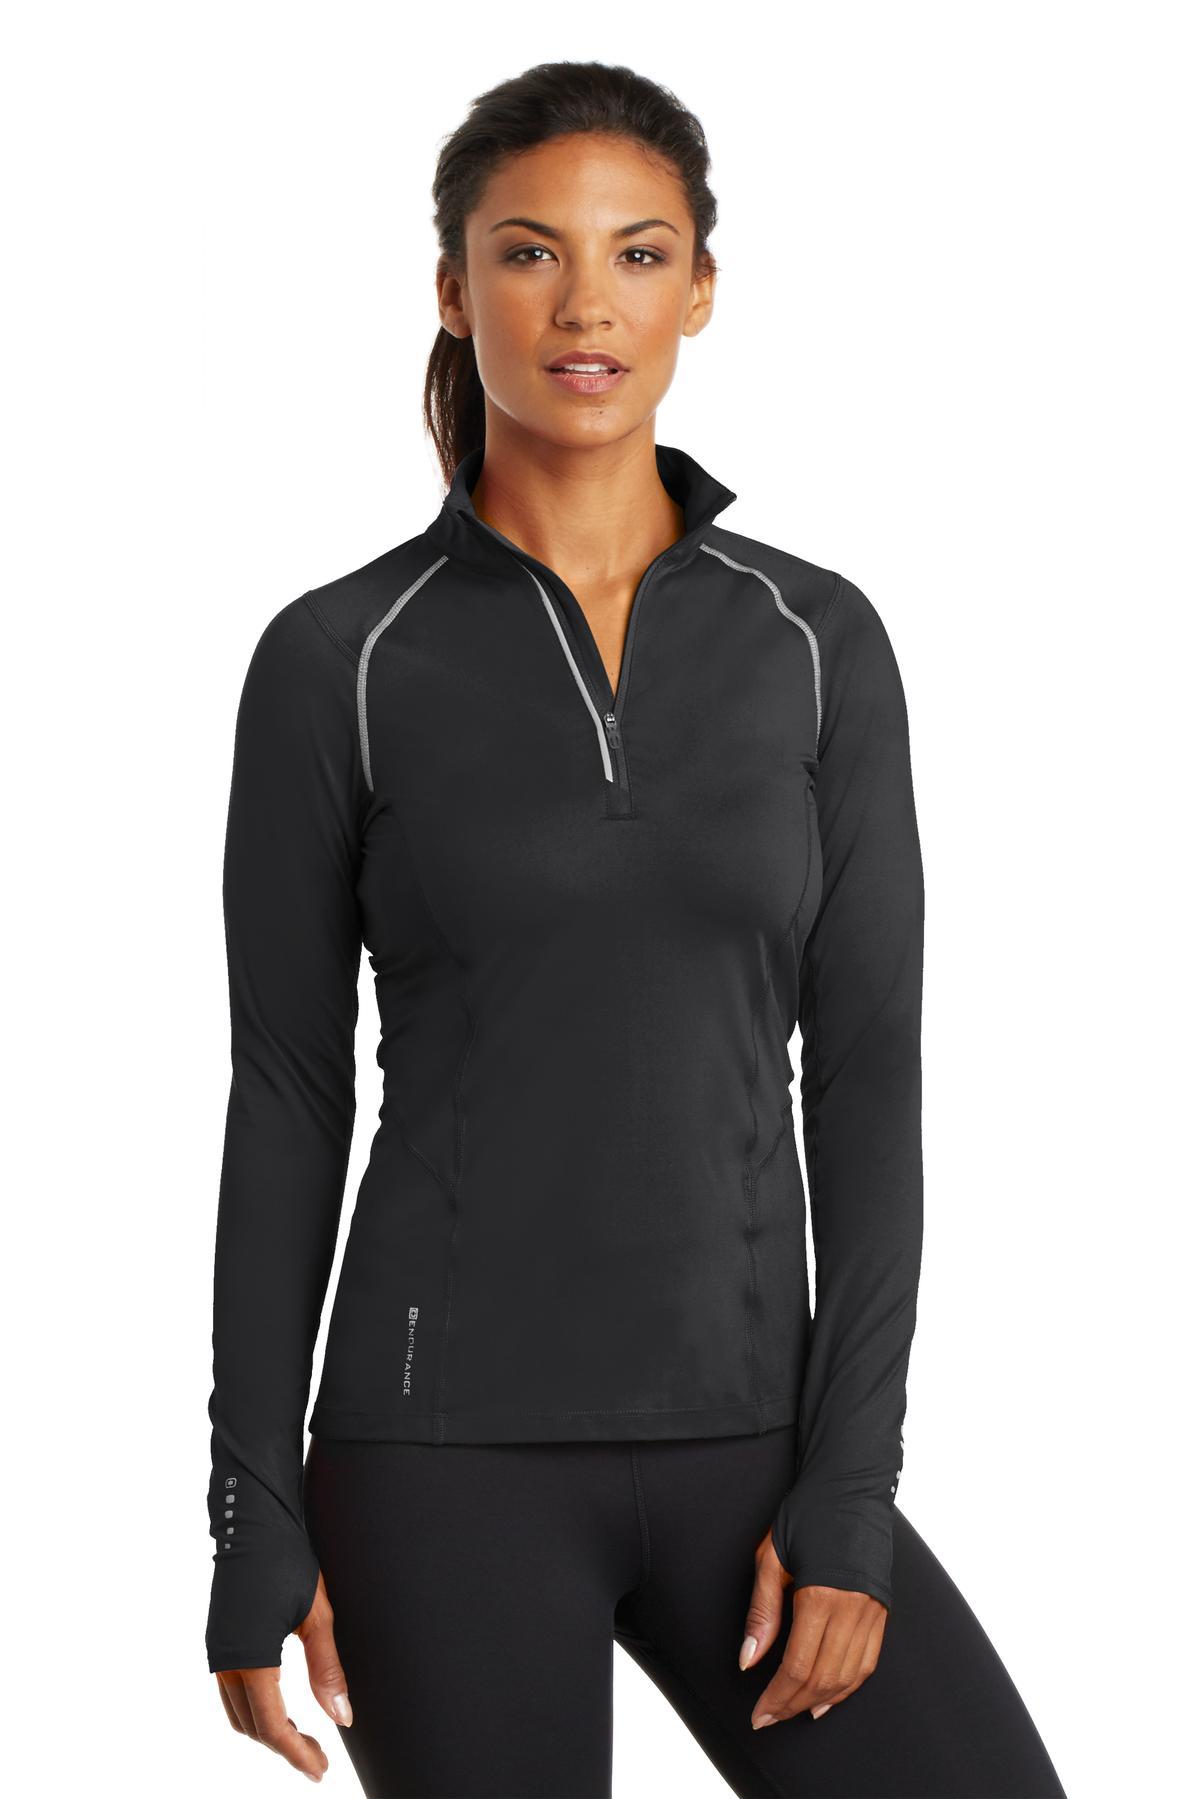 OGIO® LOE335 - ENDURANCE Ladies Nexus 1/4-Zip Pullover